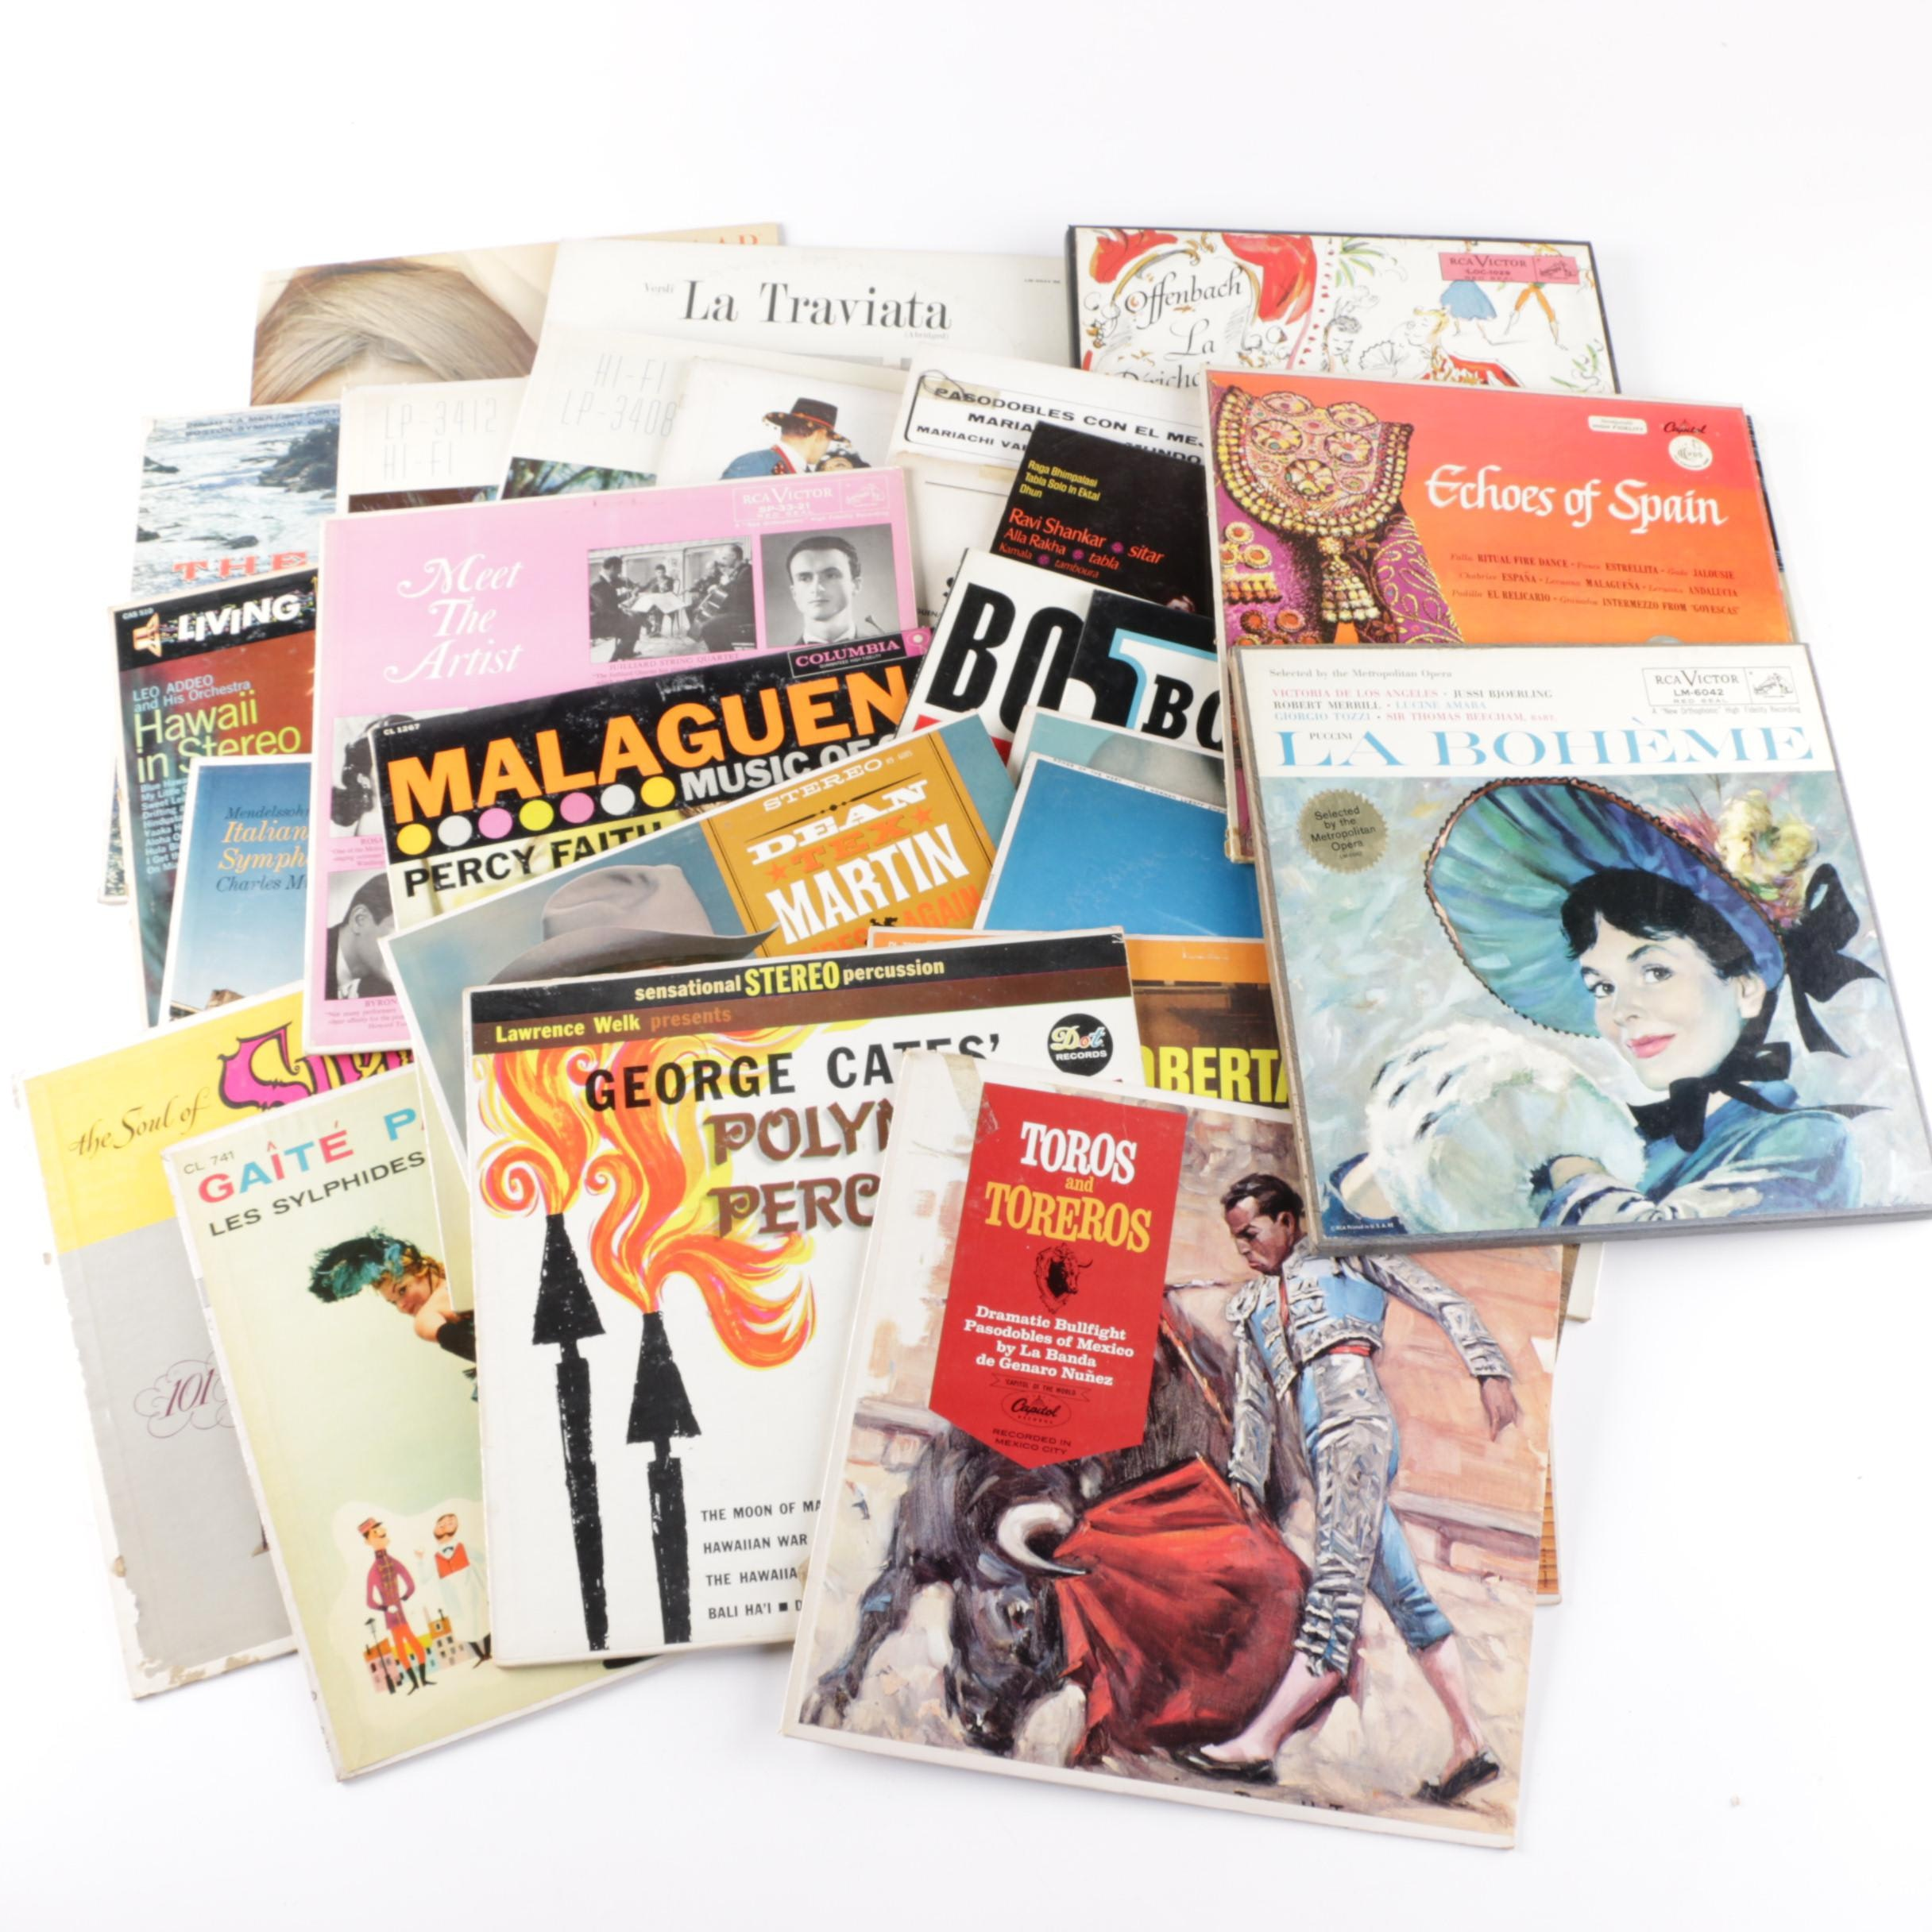 International and Hawaiian Theme Easy Listening LPs